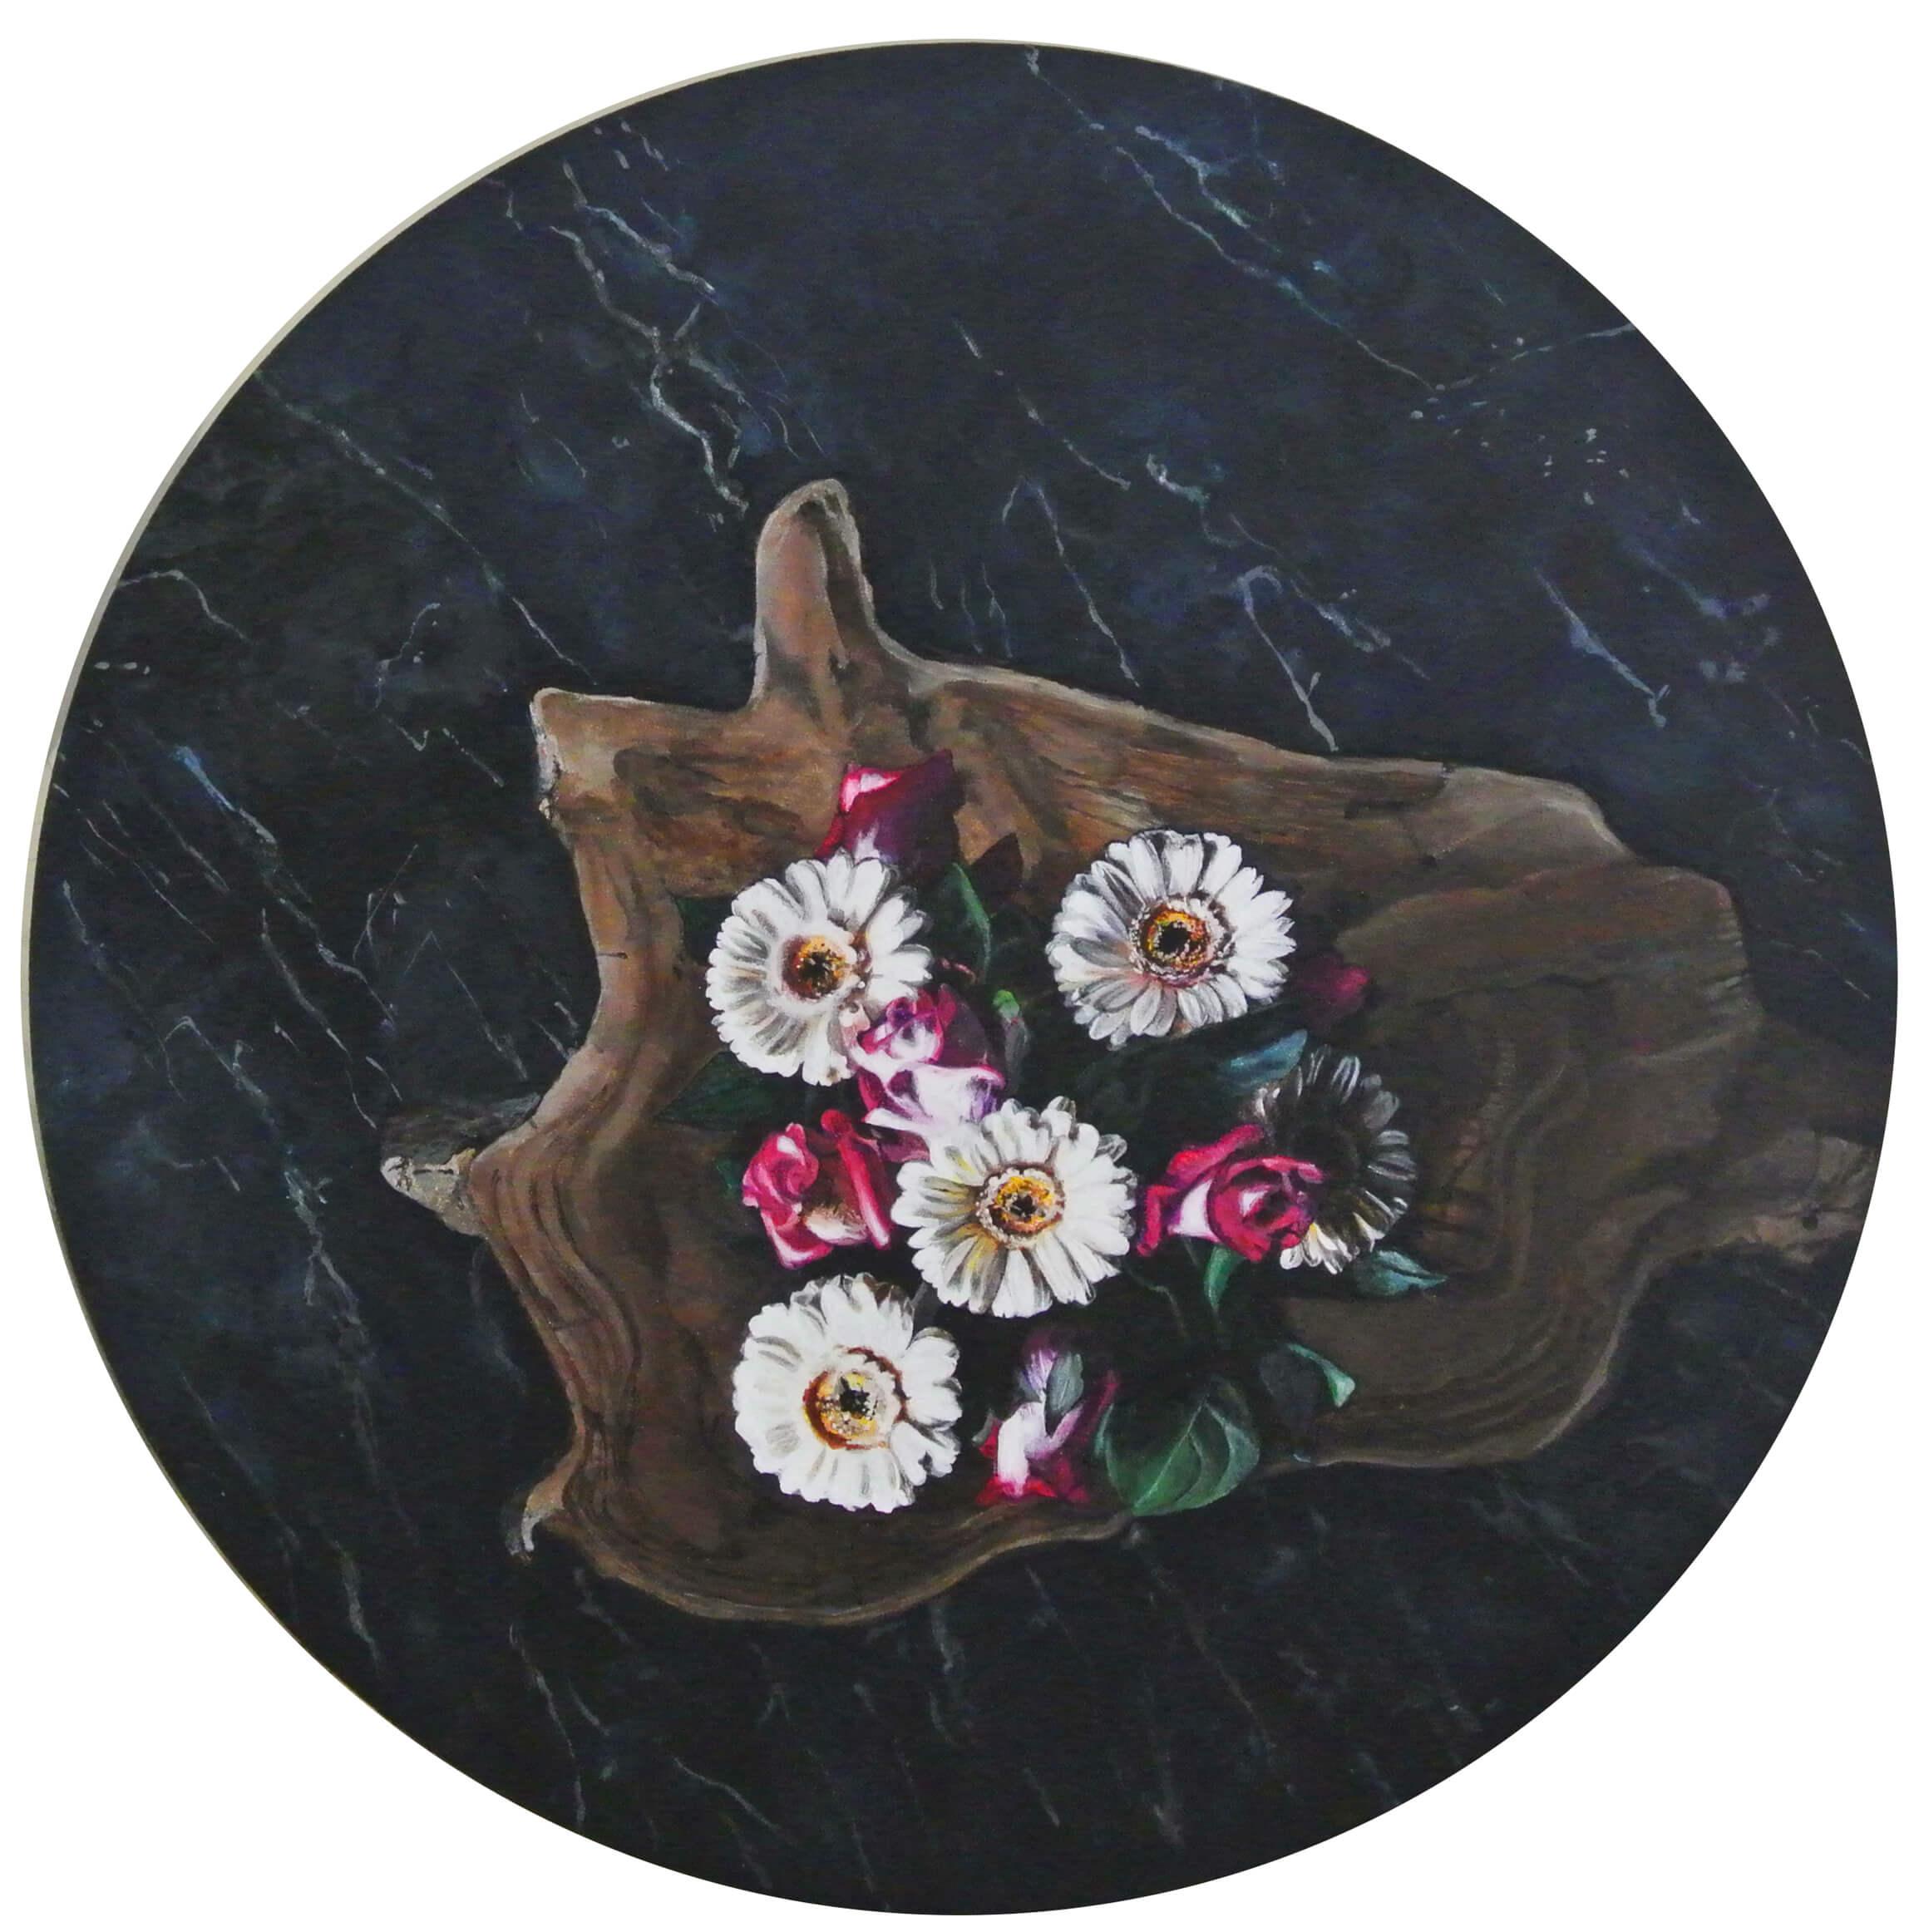 Blumen auf Marmor – Flowers and Plants, Durchm. 50 cm, 2015, © Ute Latzke, 850 Euro.